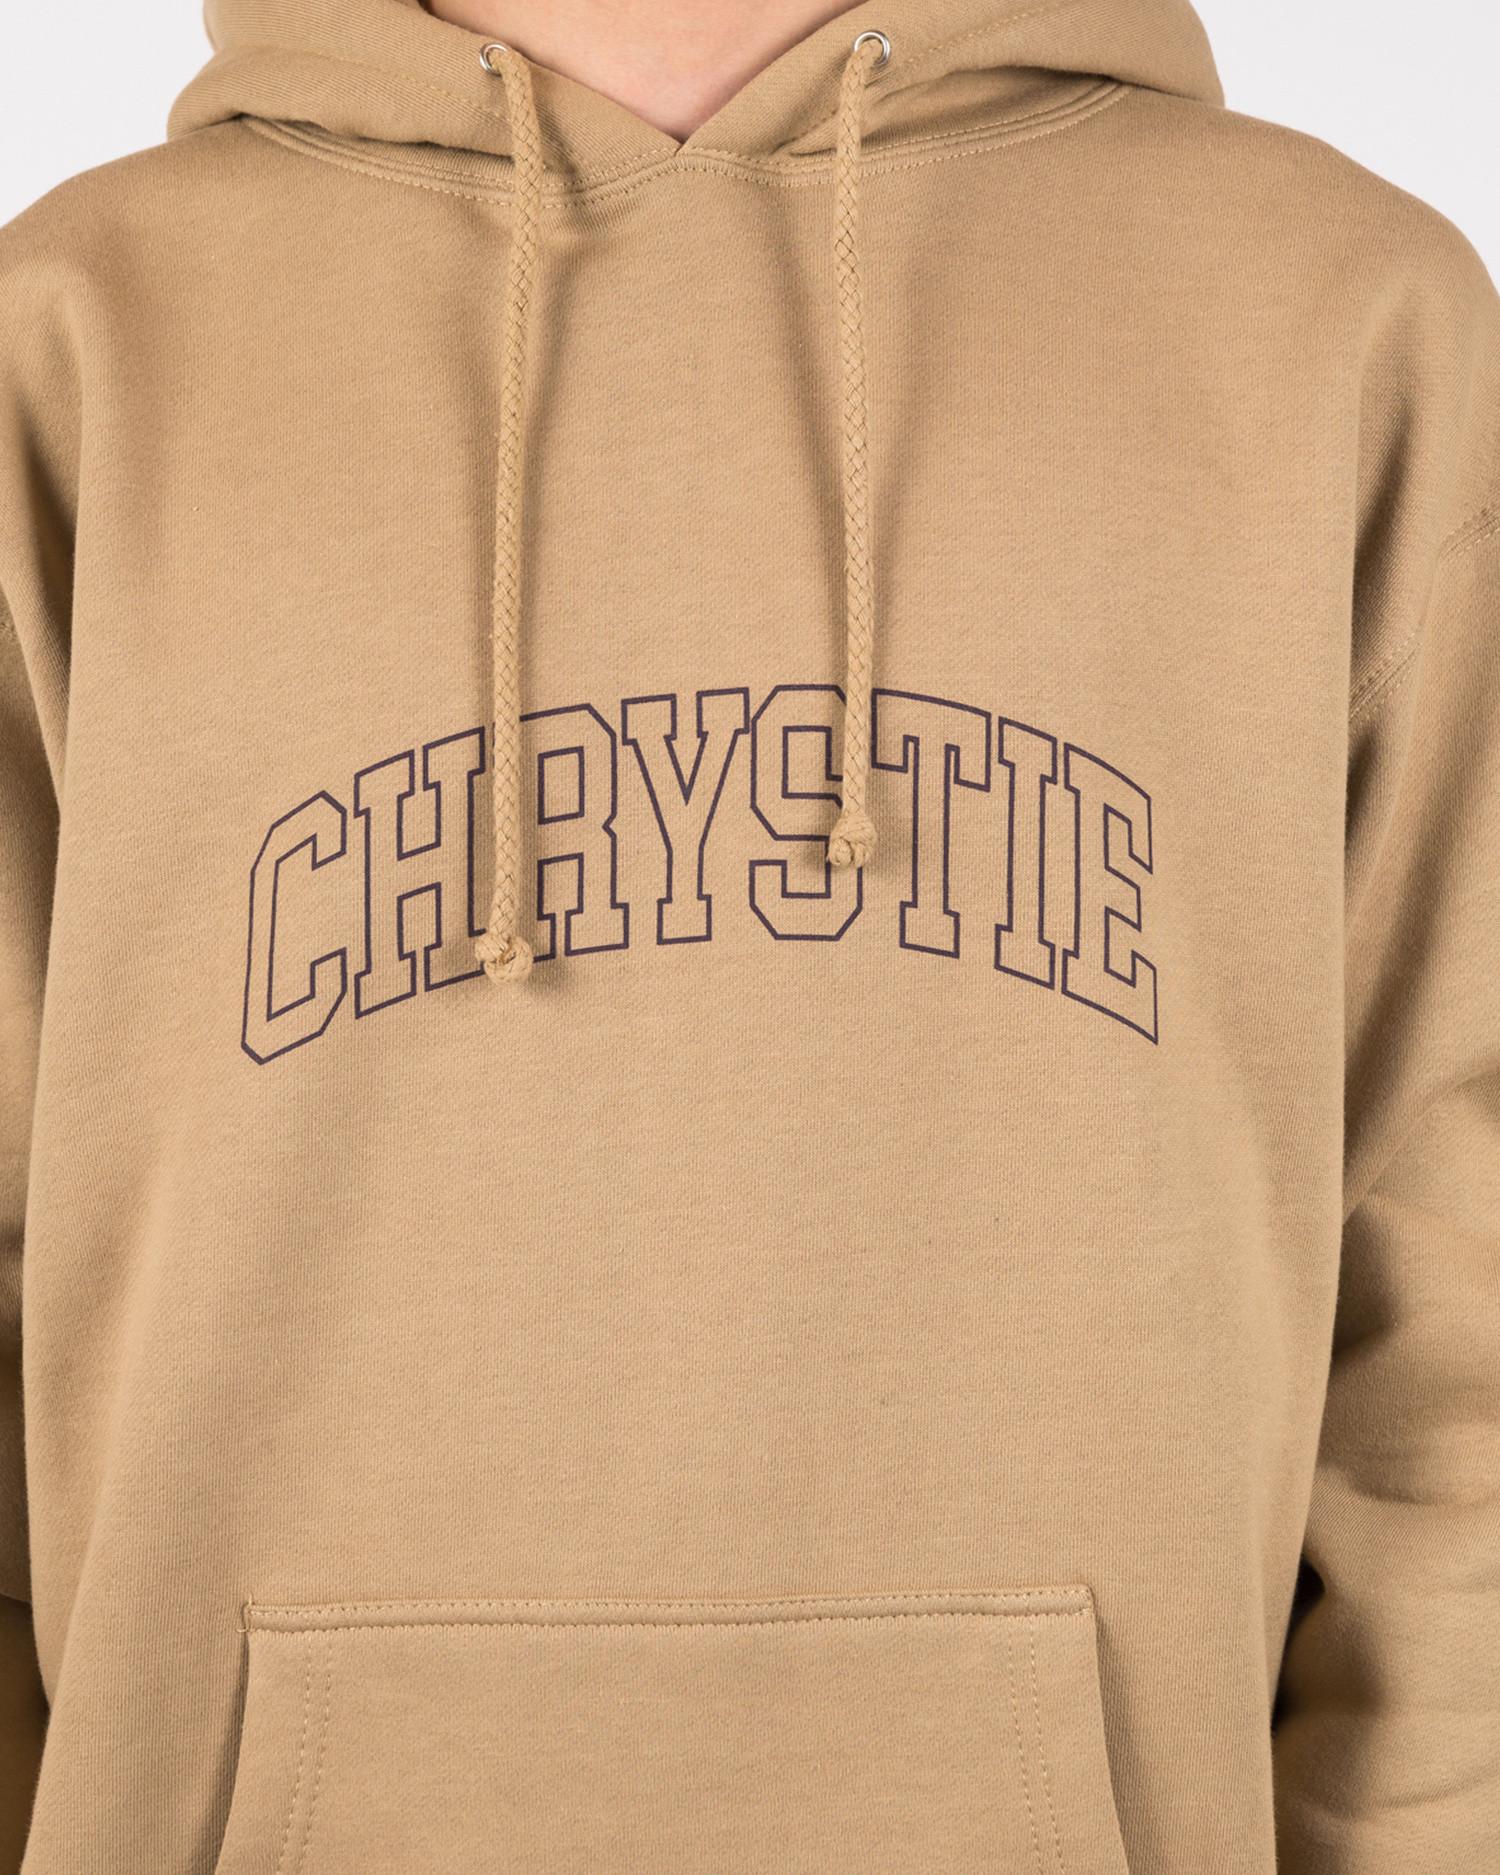 Chrystie NYC Collegiate Logo Heavyweight Hoodie Light Pink